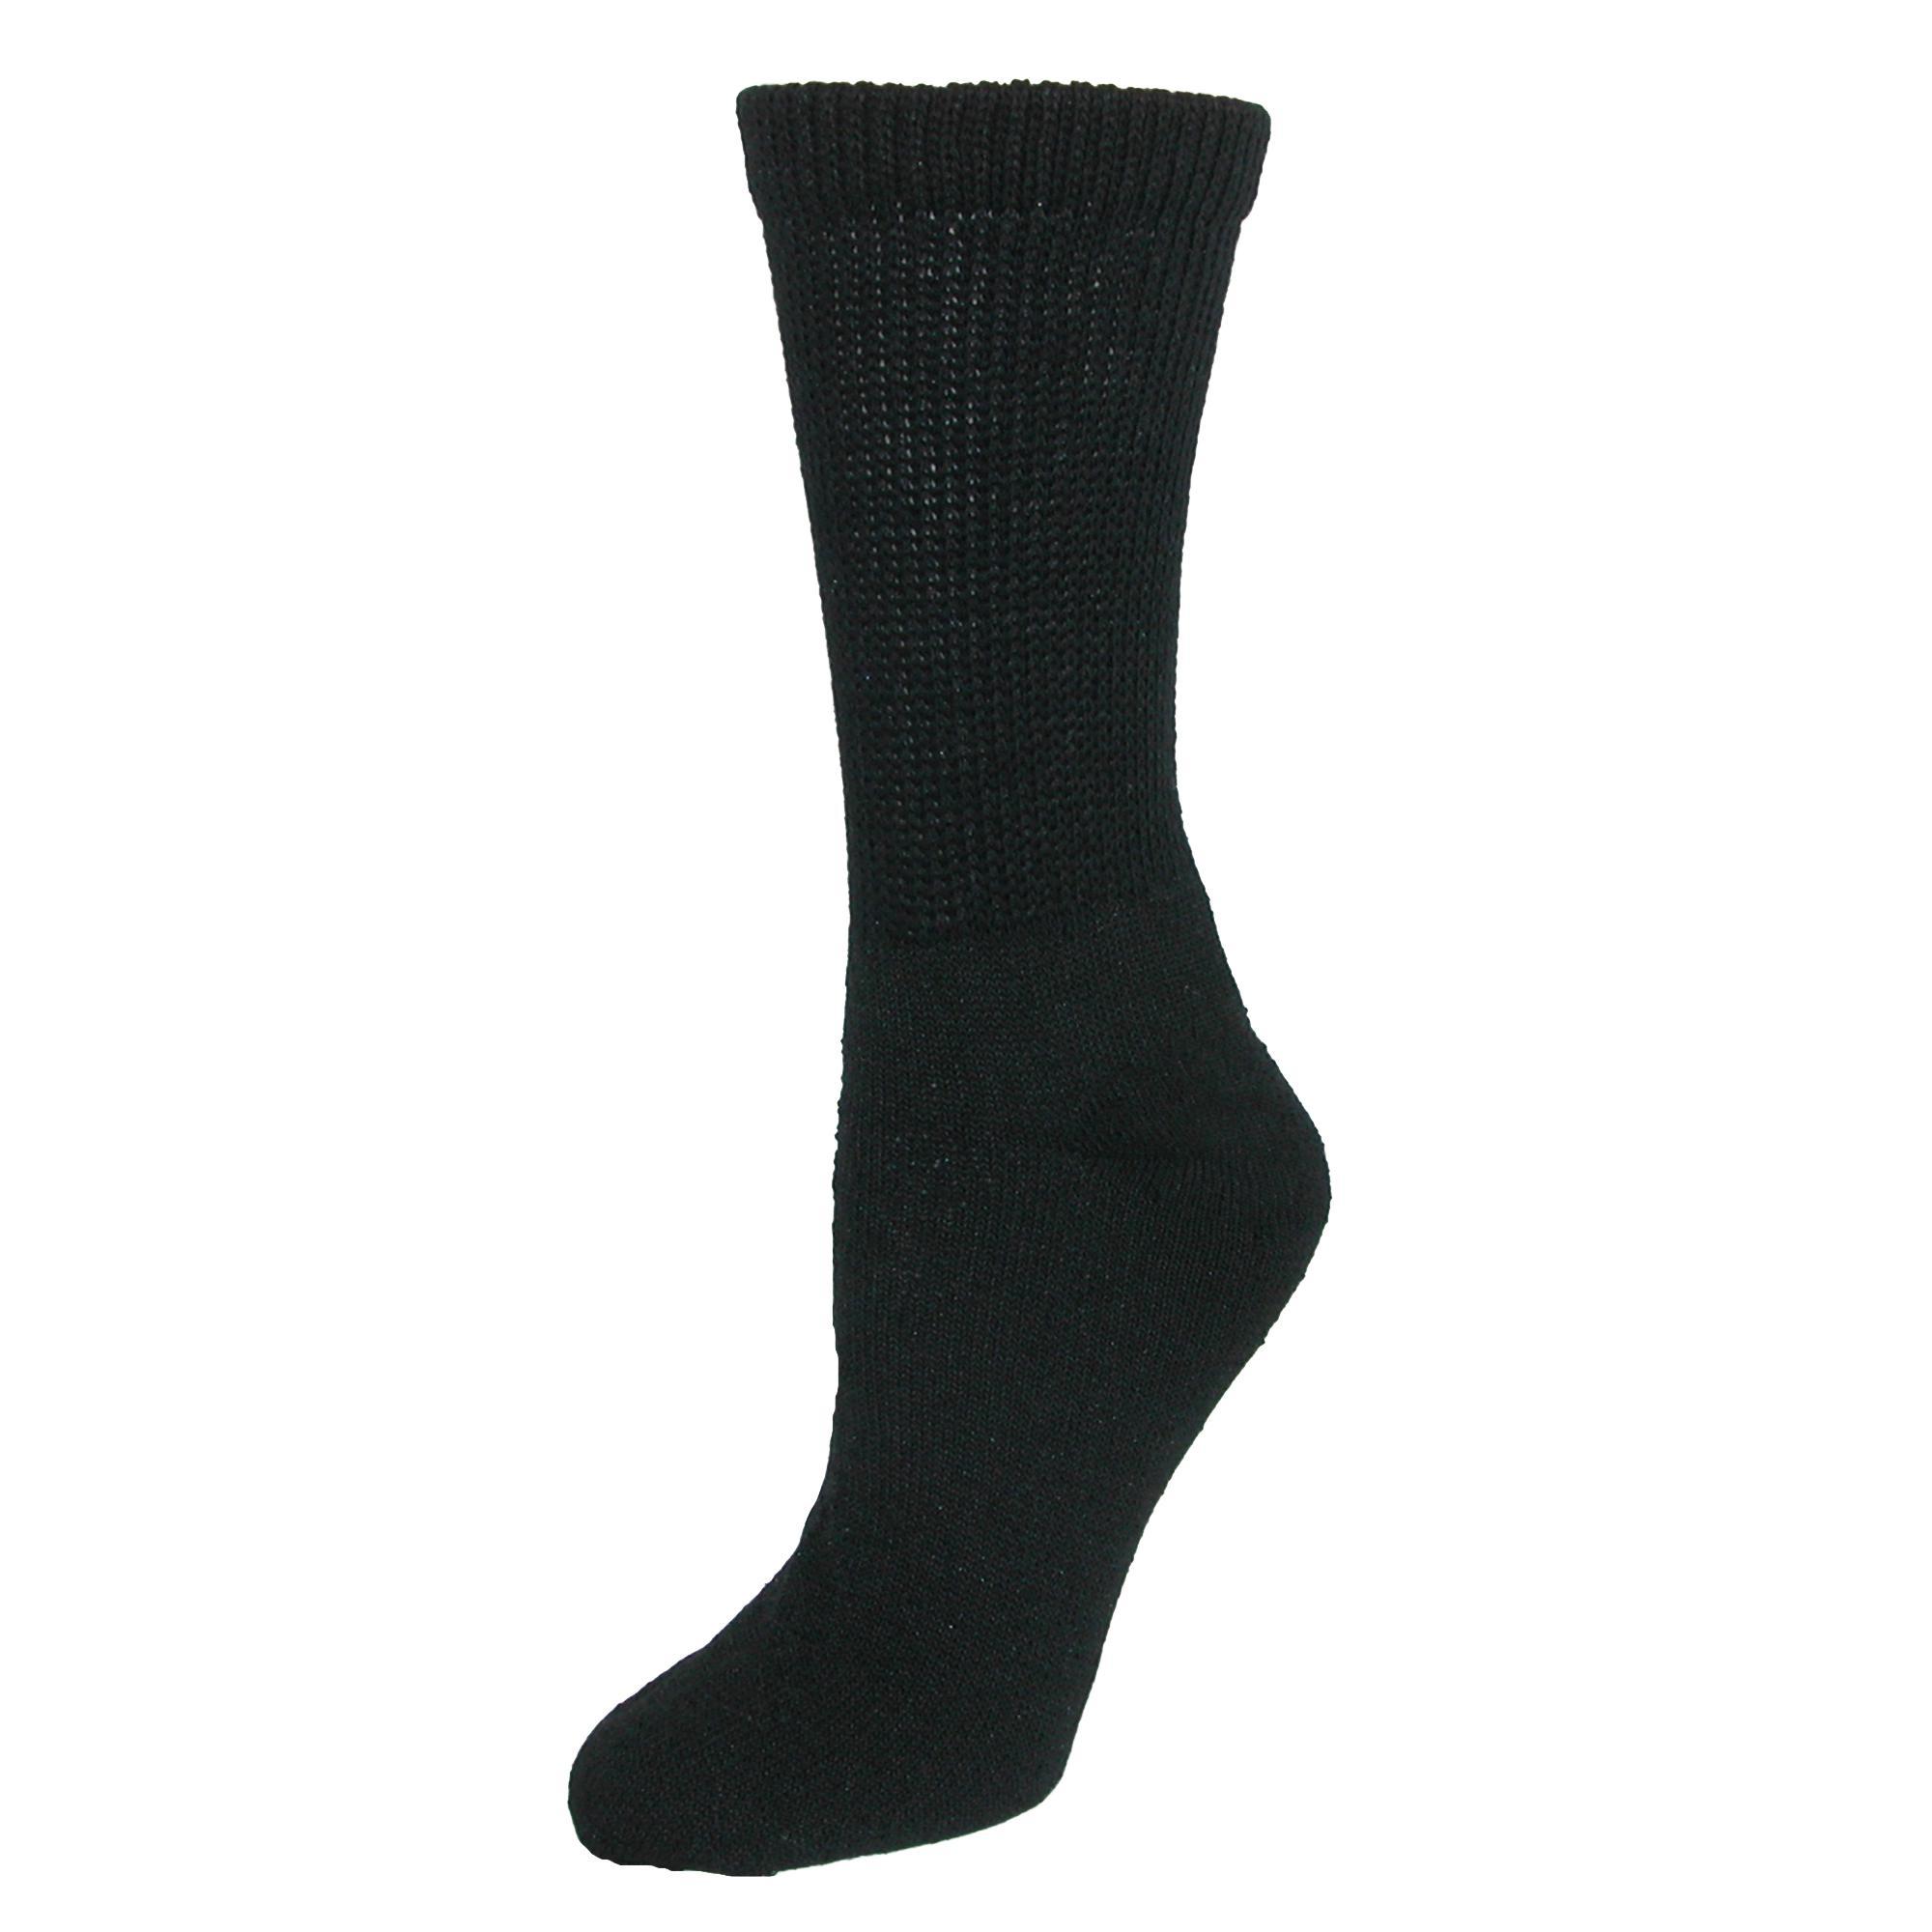 Ctm Womens Diabetic Crew Socks (3 Pair Pack)